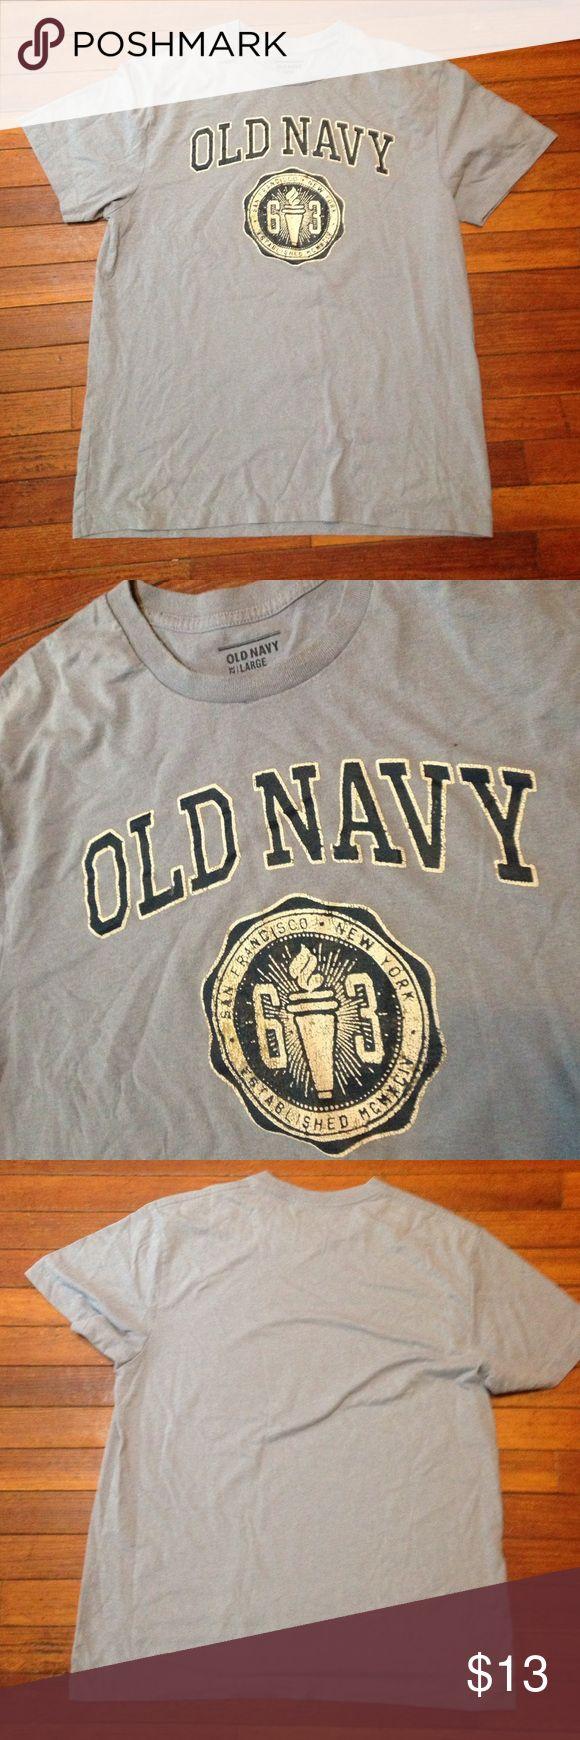 ❤️$13 SALE MENS LARGE Old Navy ❤️❤️$13 SALE MENS LARGE old navy short sleeve top blue cotton front logo comfy Old Navy Shirts Tees - Short Sleeve